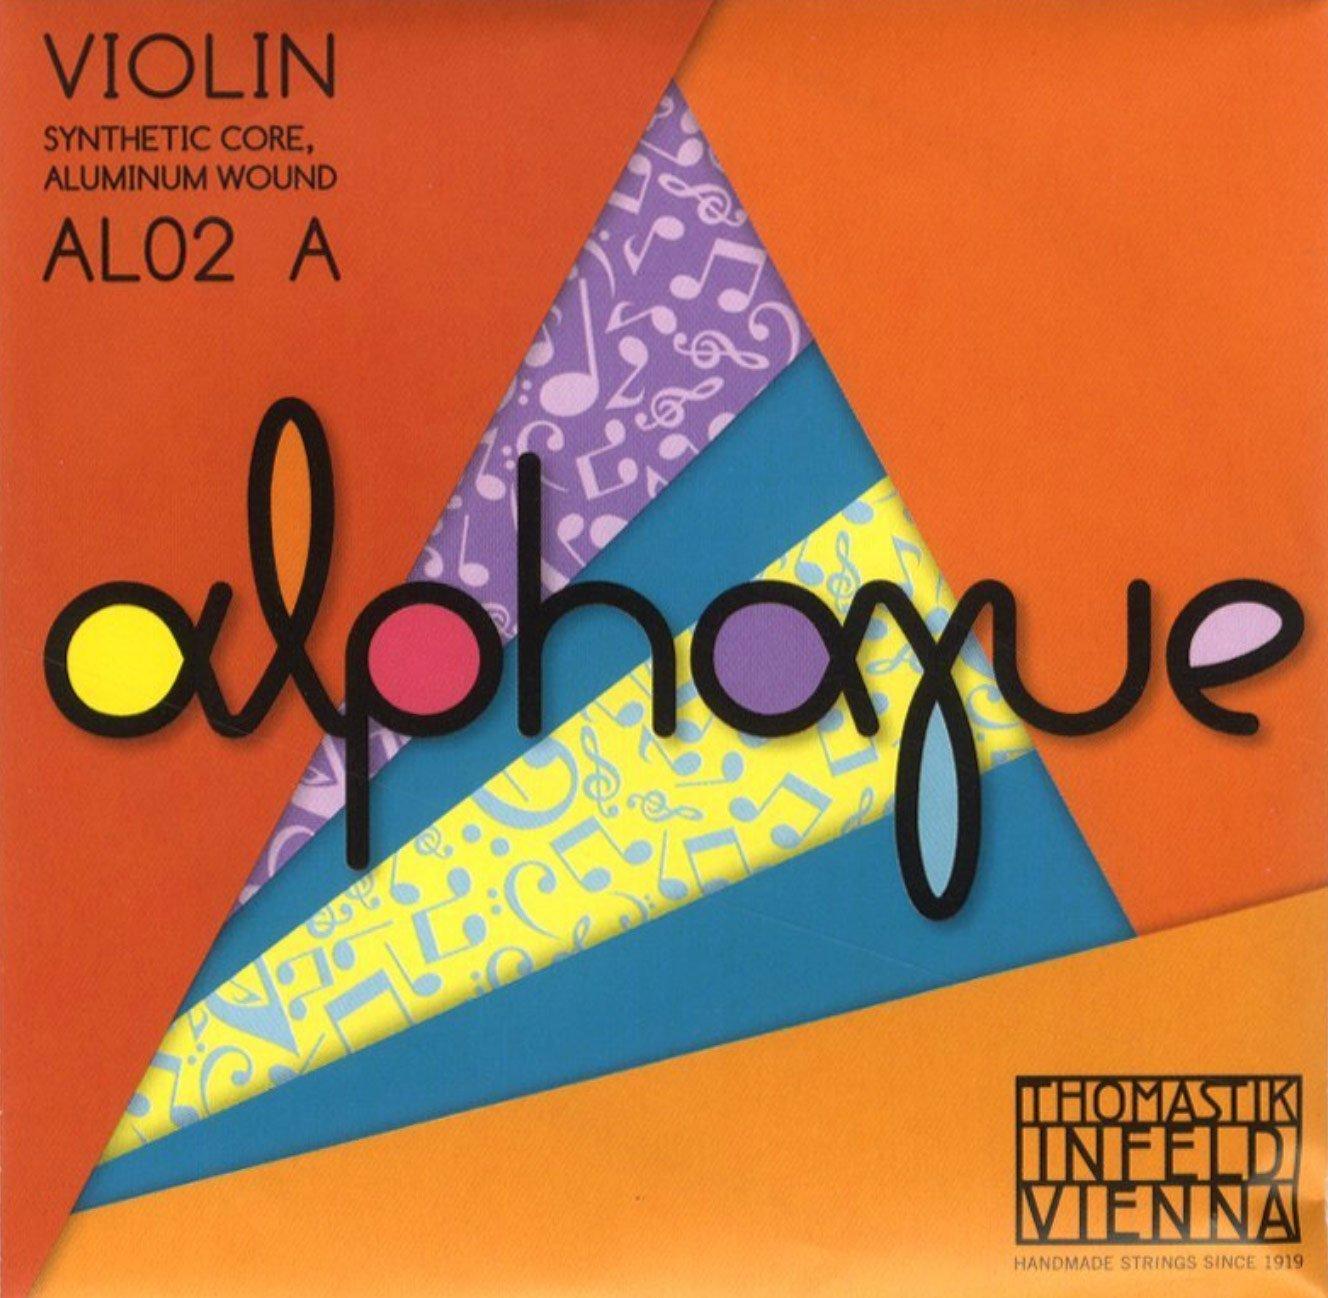 Violin String (A) | Thomastik Alphayue